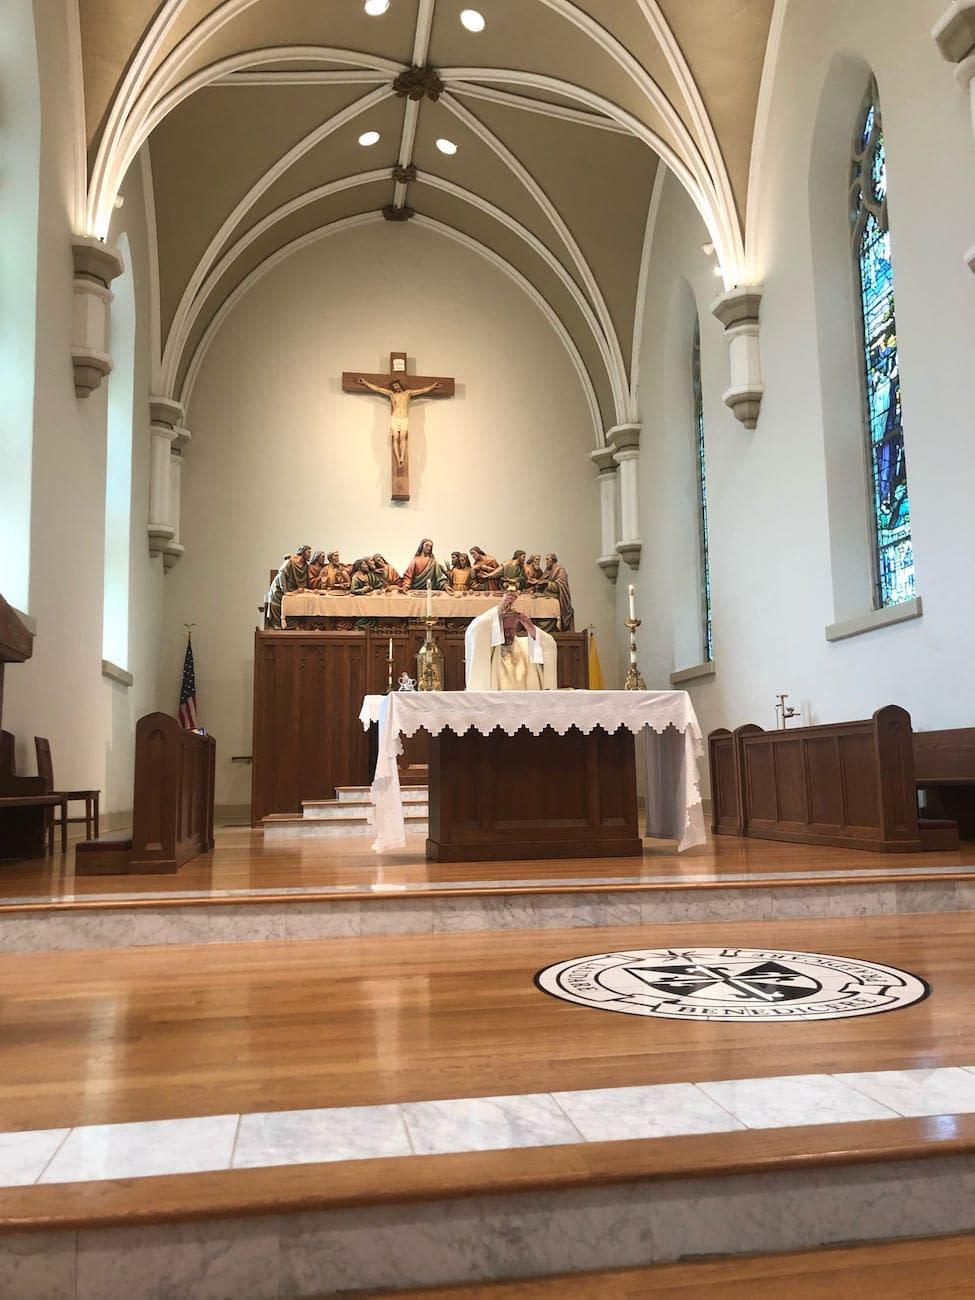 Sanctuary of St. Rose